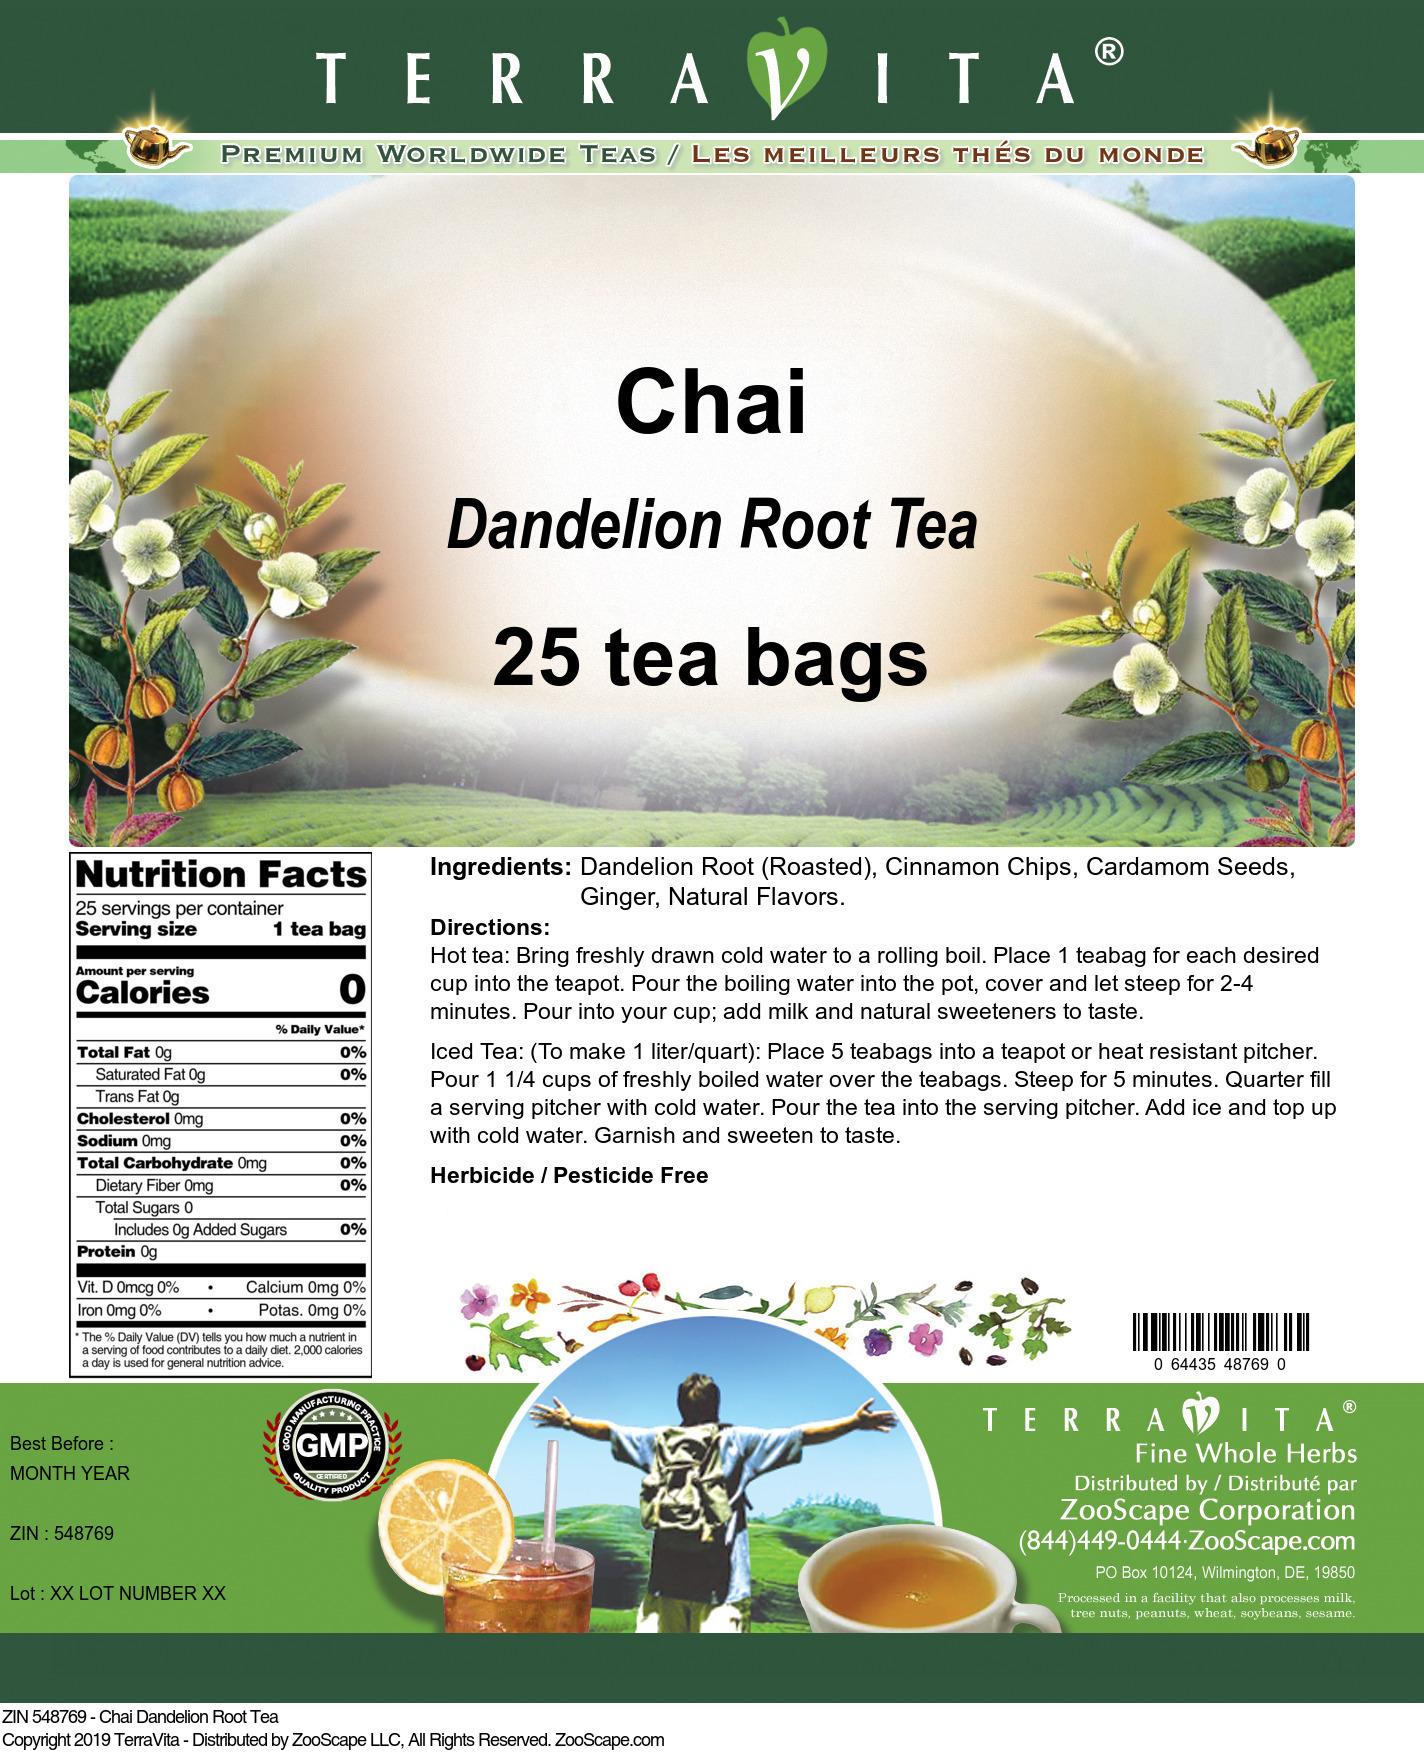 Chai Dandelion Root